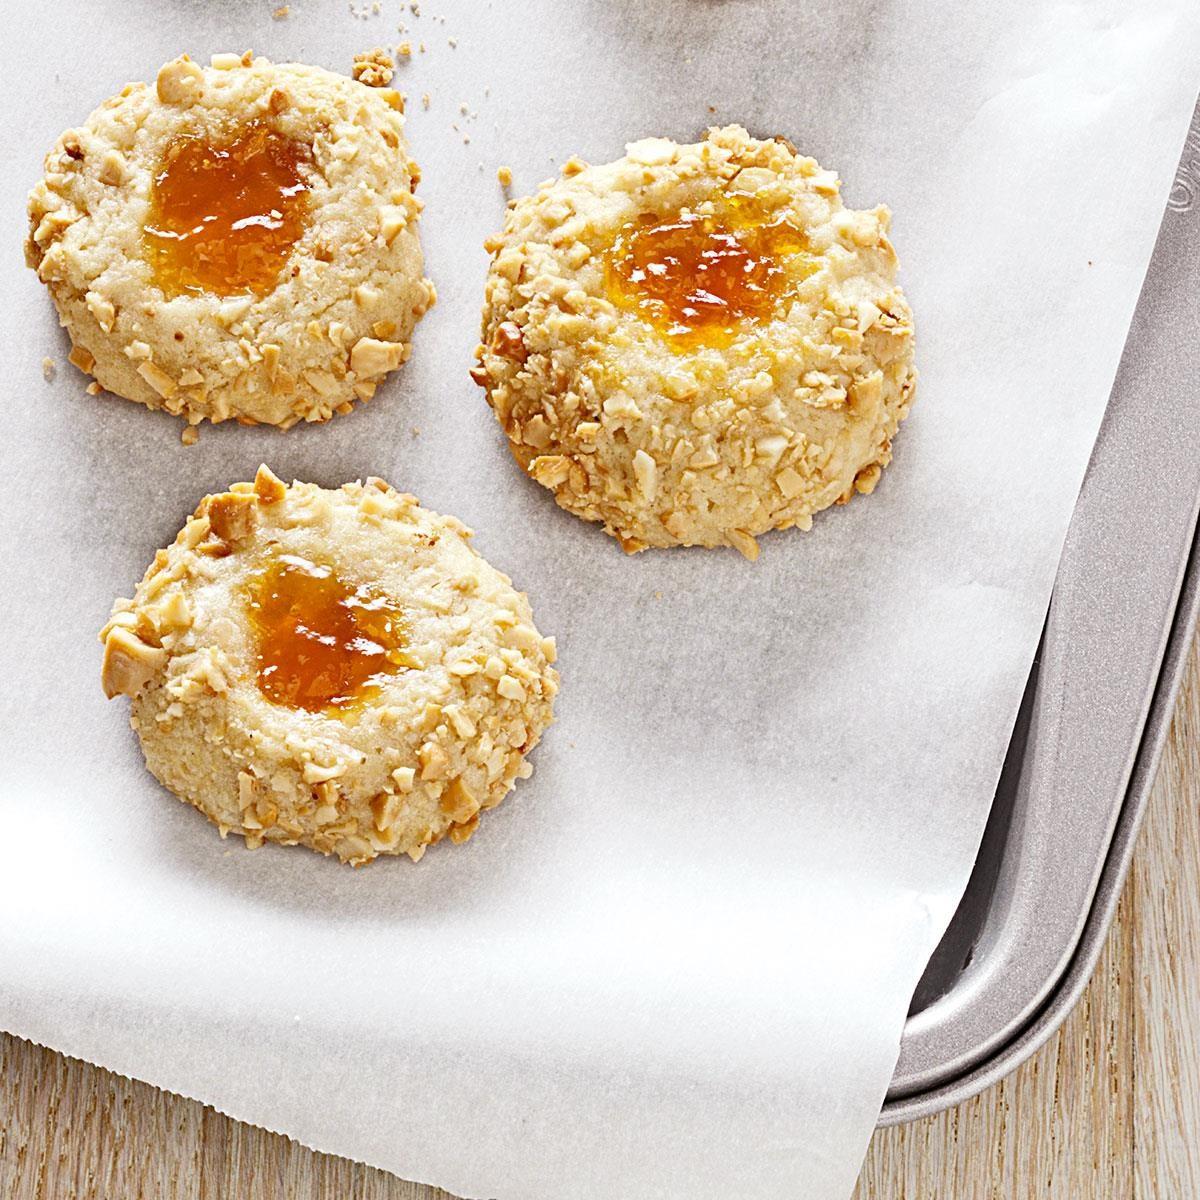 Apricot Thumbprints Recipe | Taste of Home